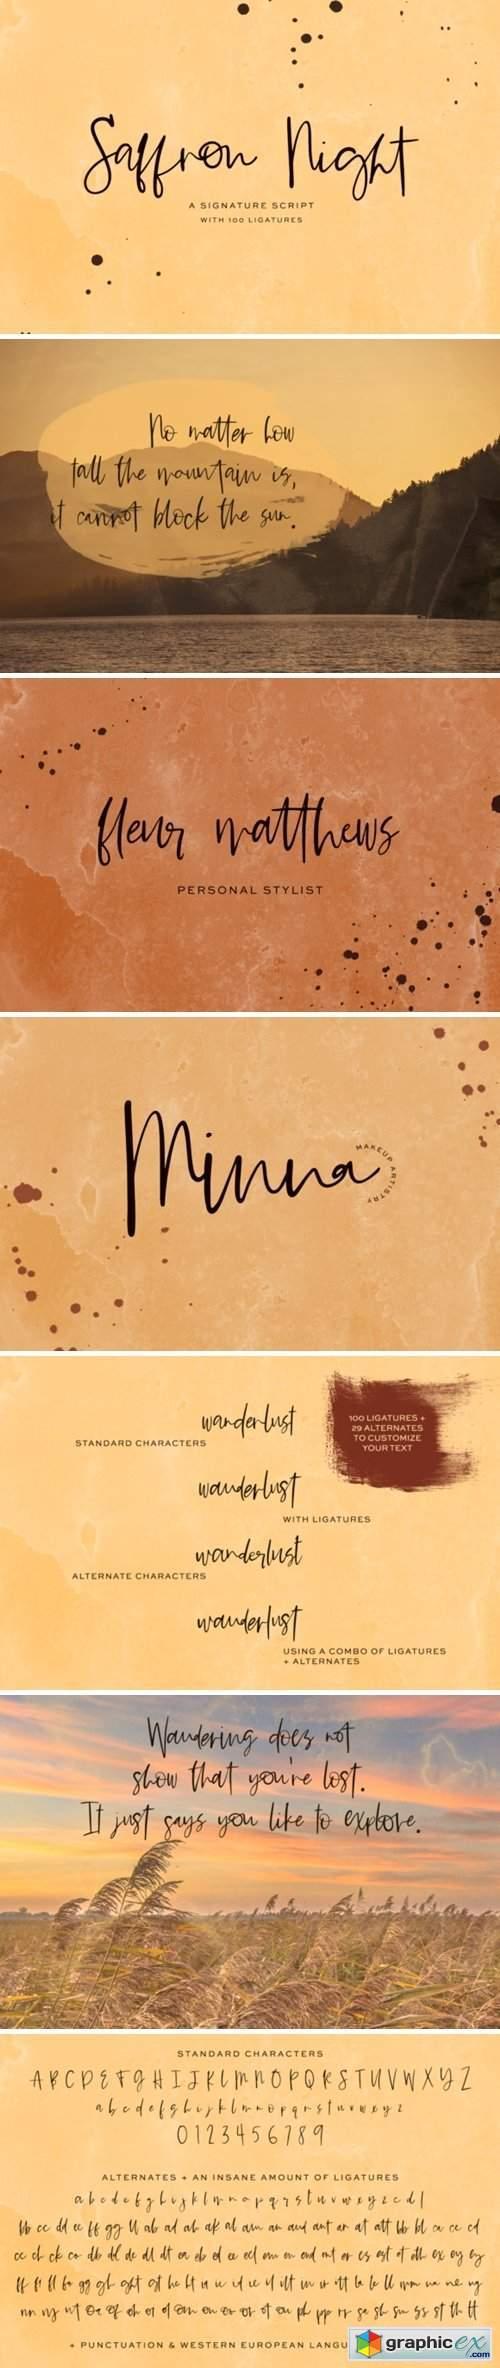 Saffron Night Font